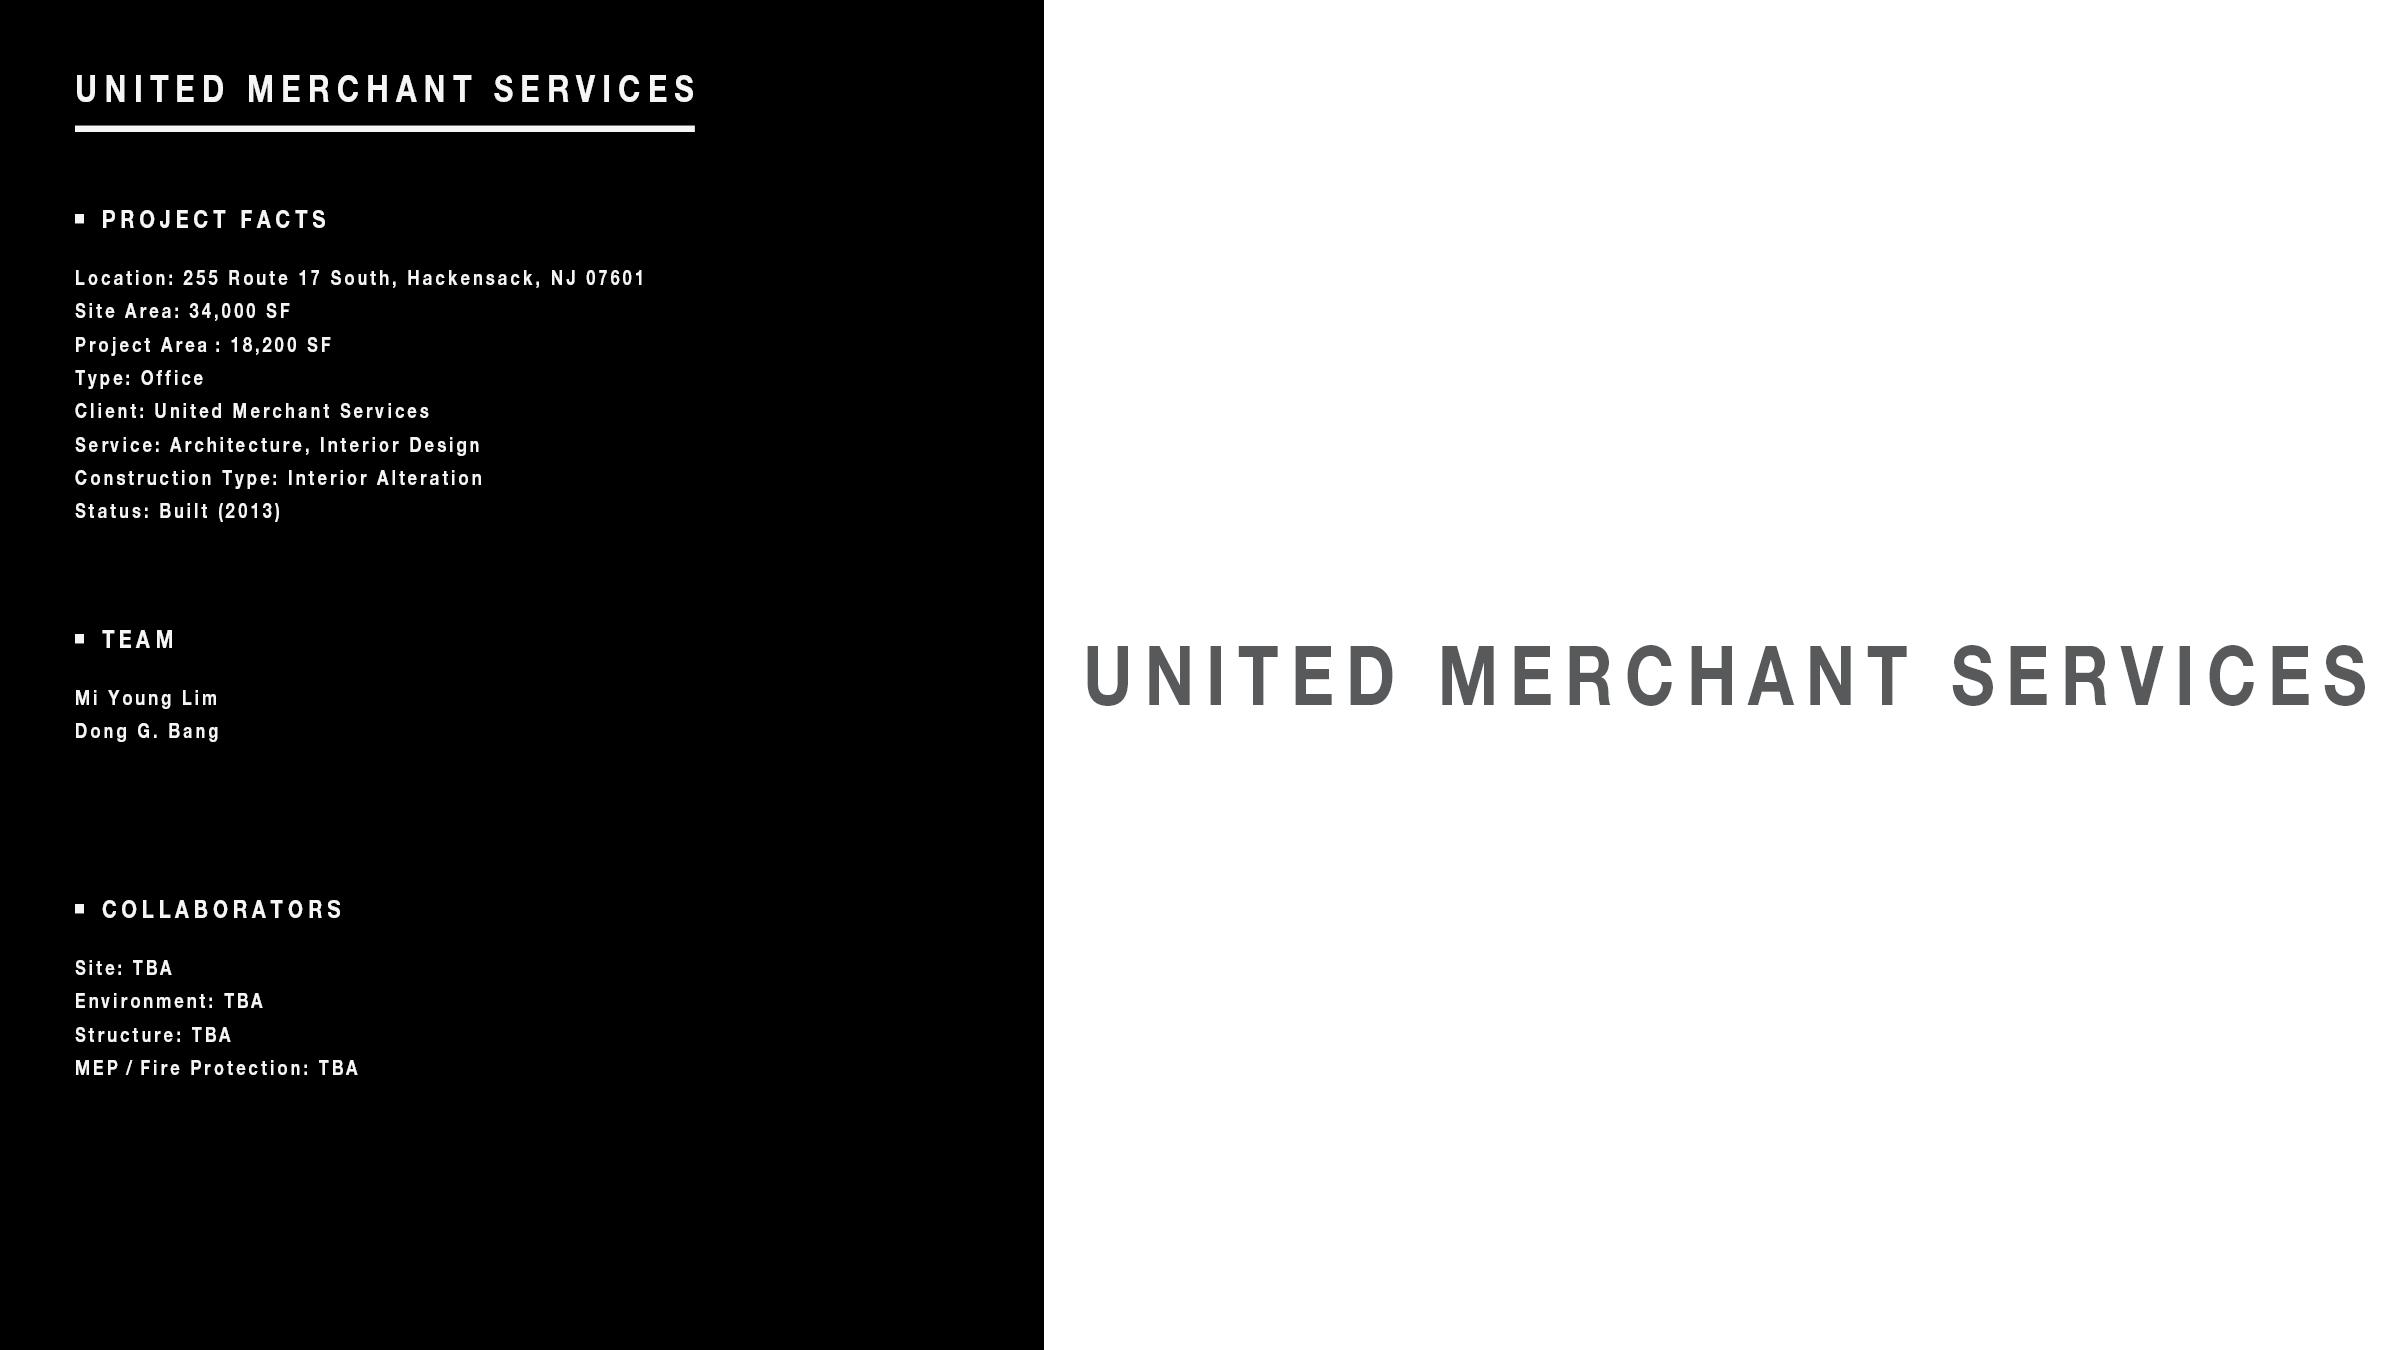 Pioli_United Merchant Services.png